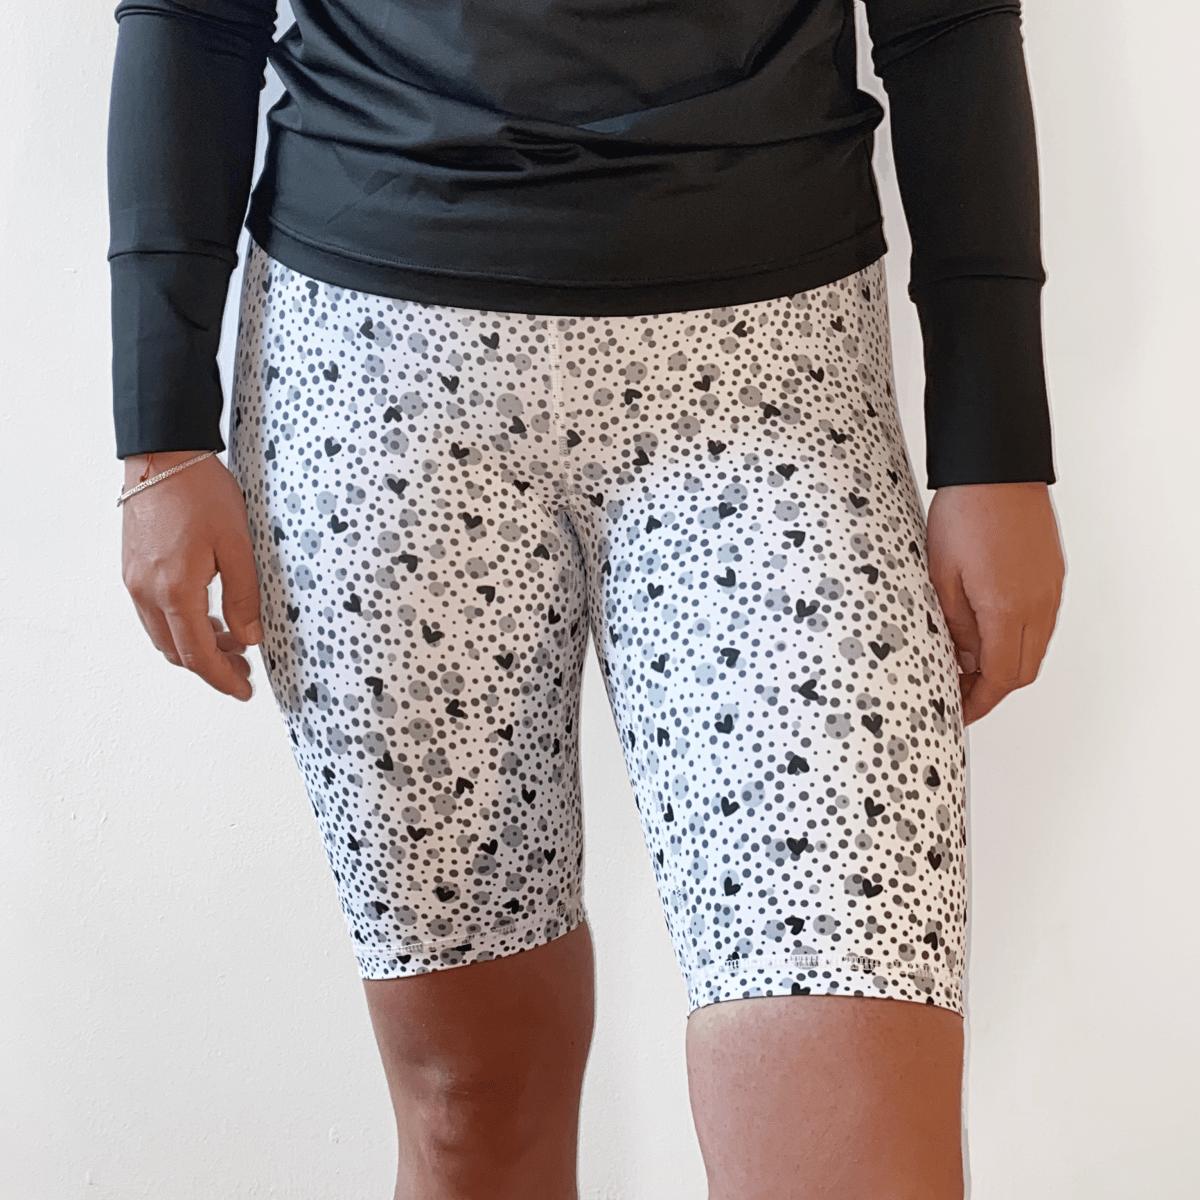 Sparkle Shorts - White